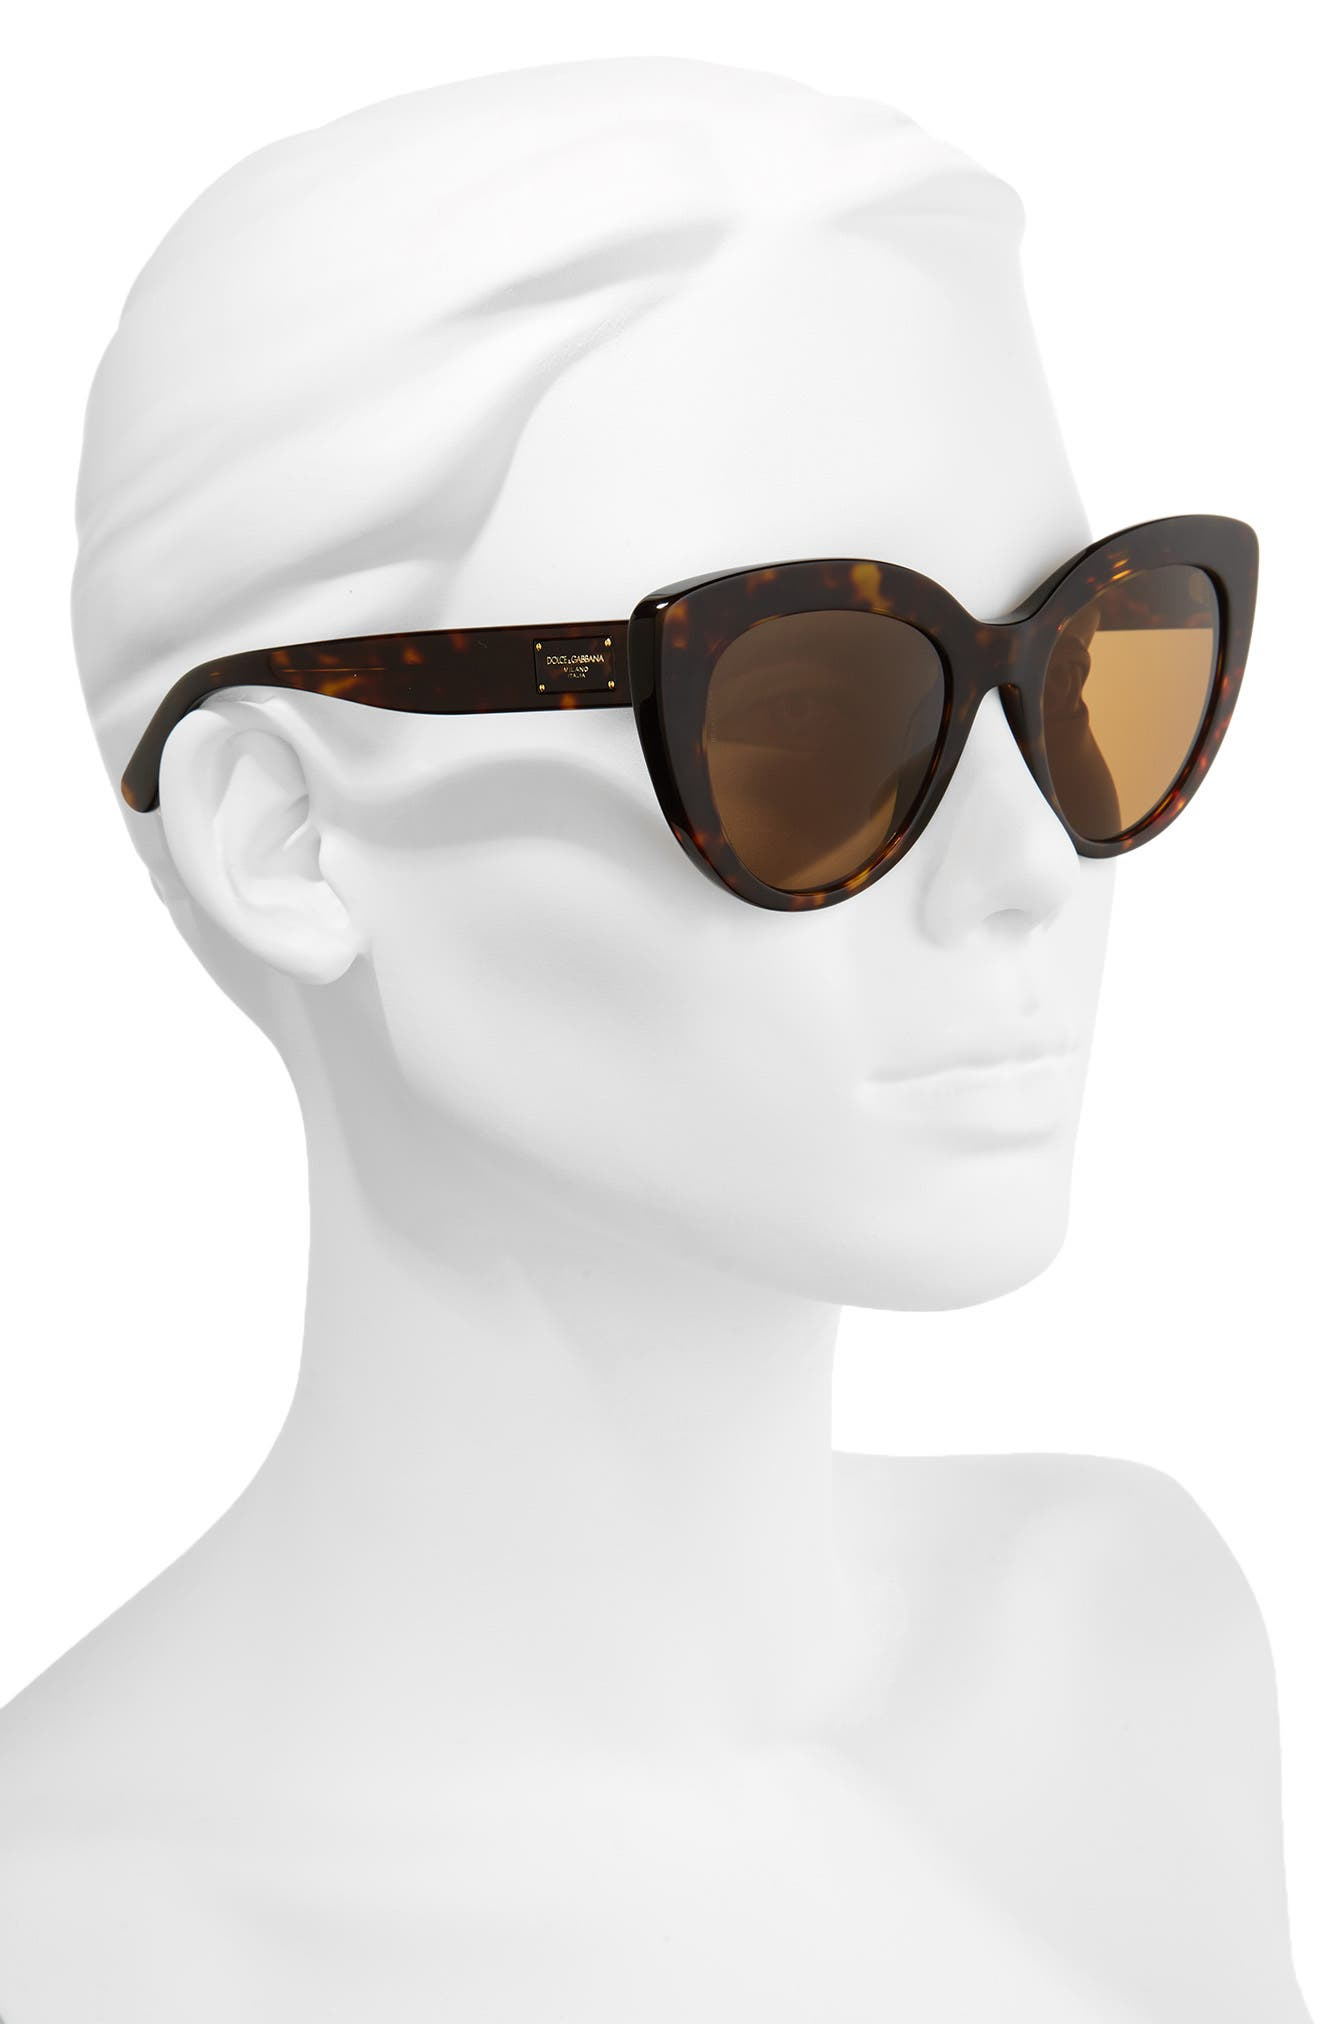 Dolce&Gabbana 53mm Polarized Cat Eye Sunglasses,                             Alternate thumbnail 2, color,                             200